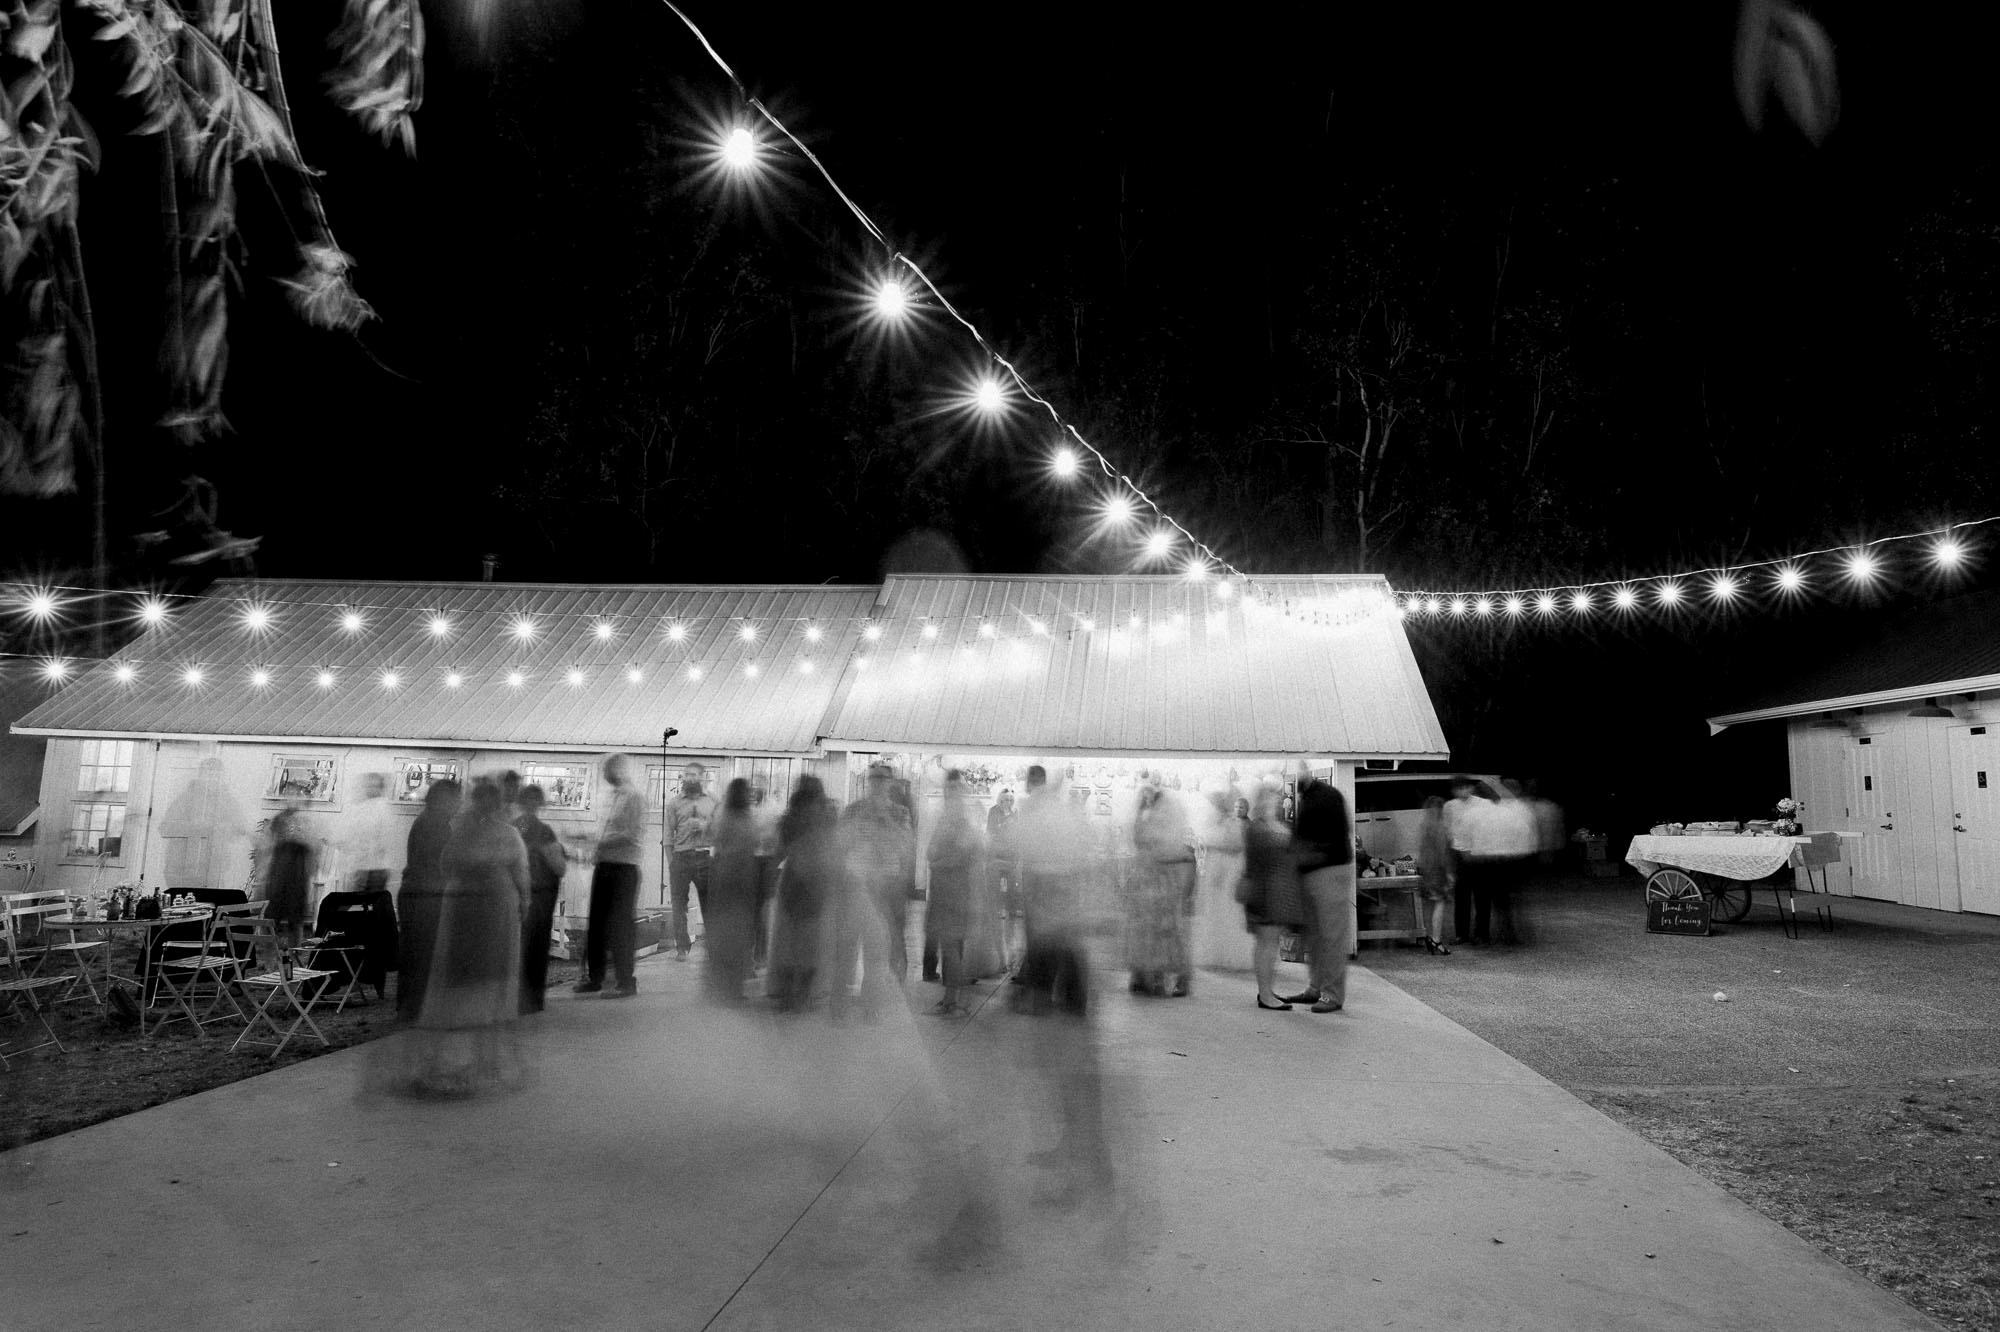 whidbey-island-wayfarer-destination-wedding 34.jpg